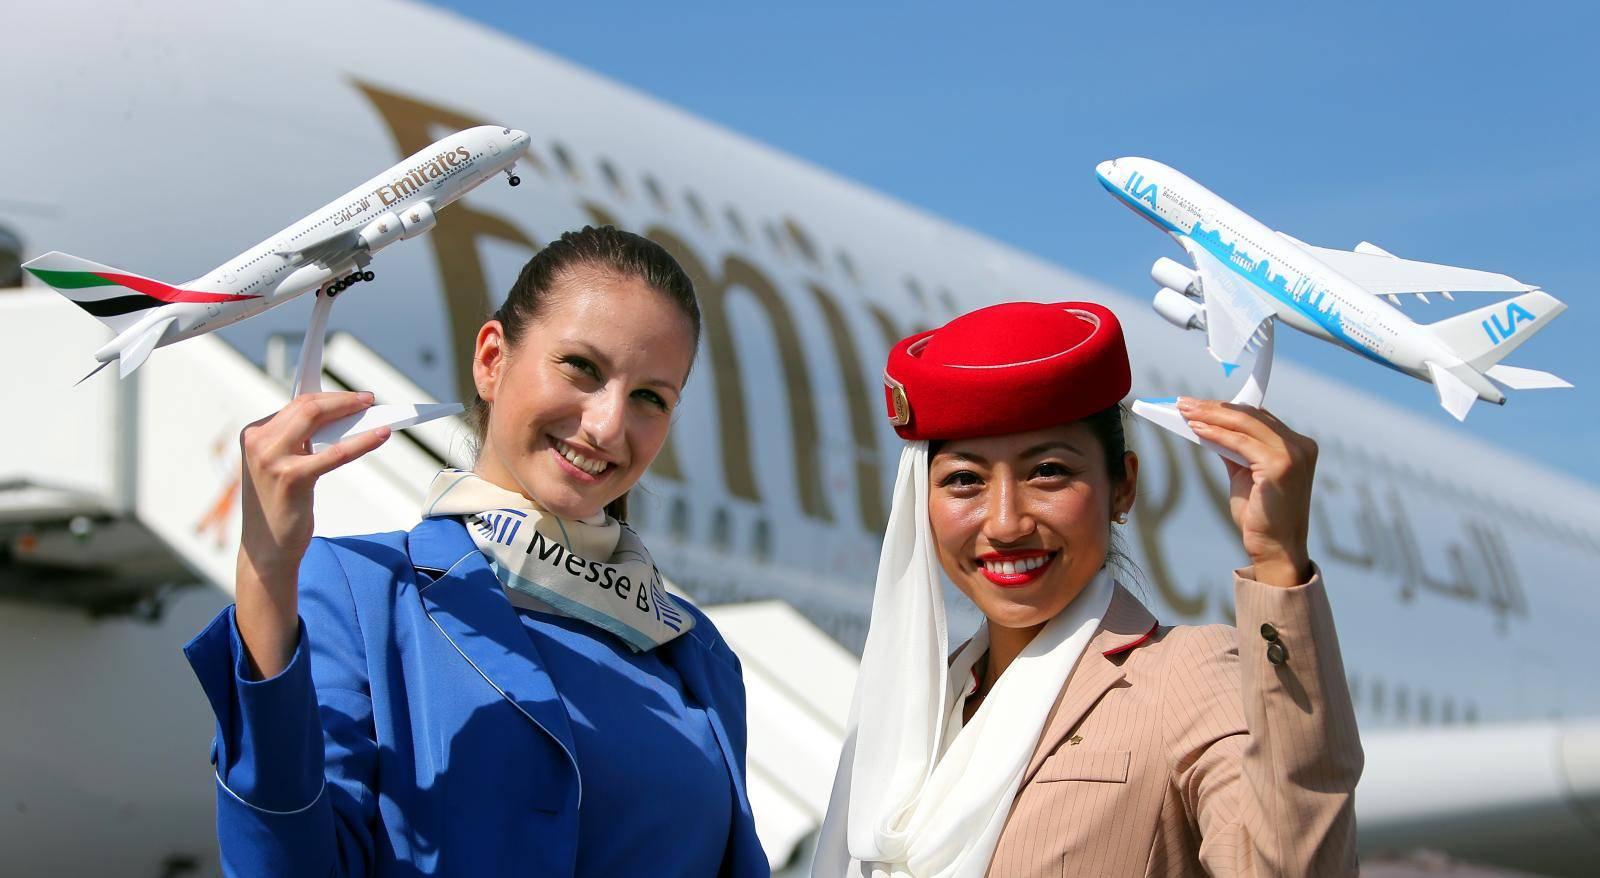 ILA Berlin Air Show 2014